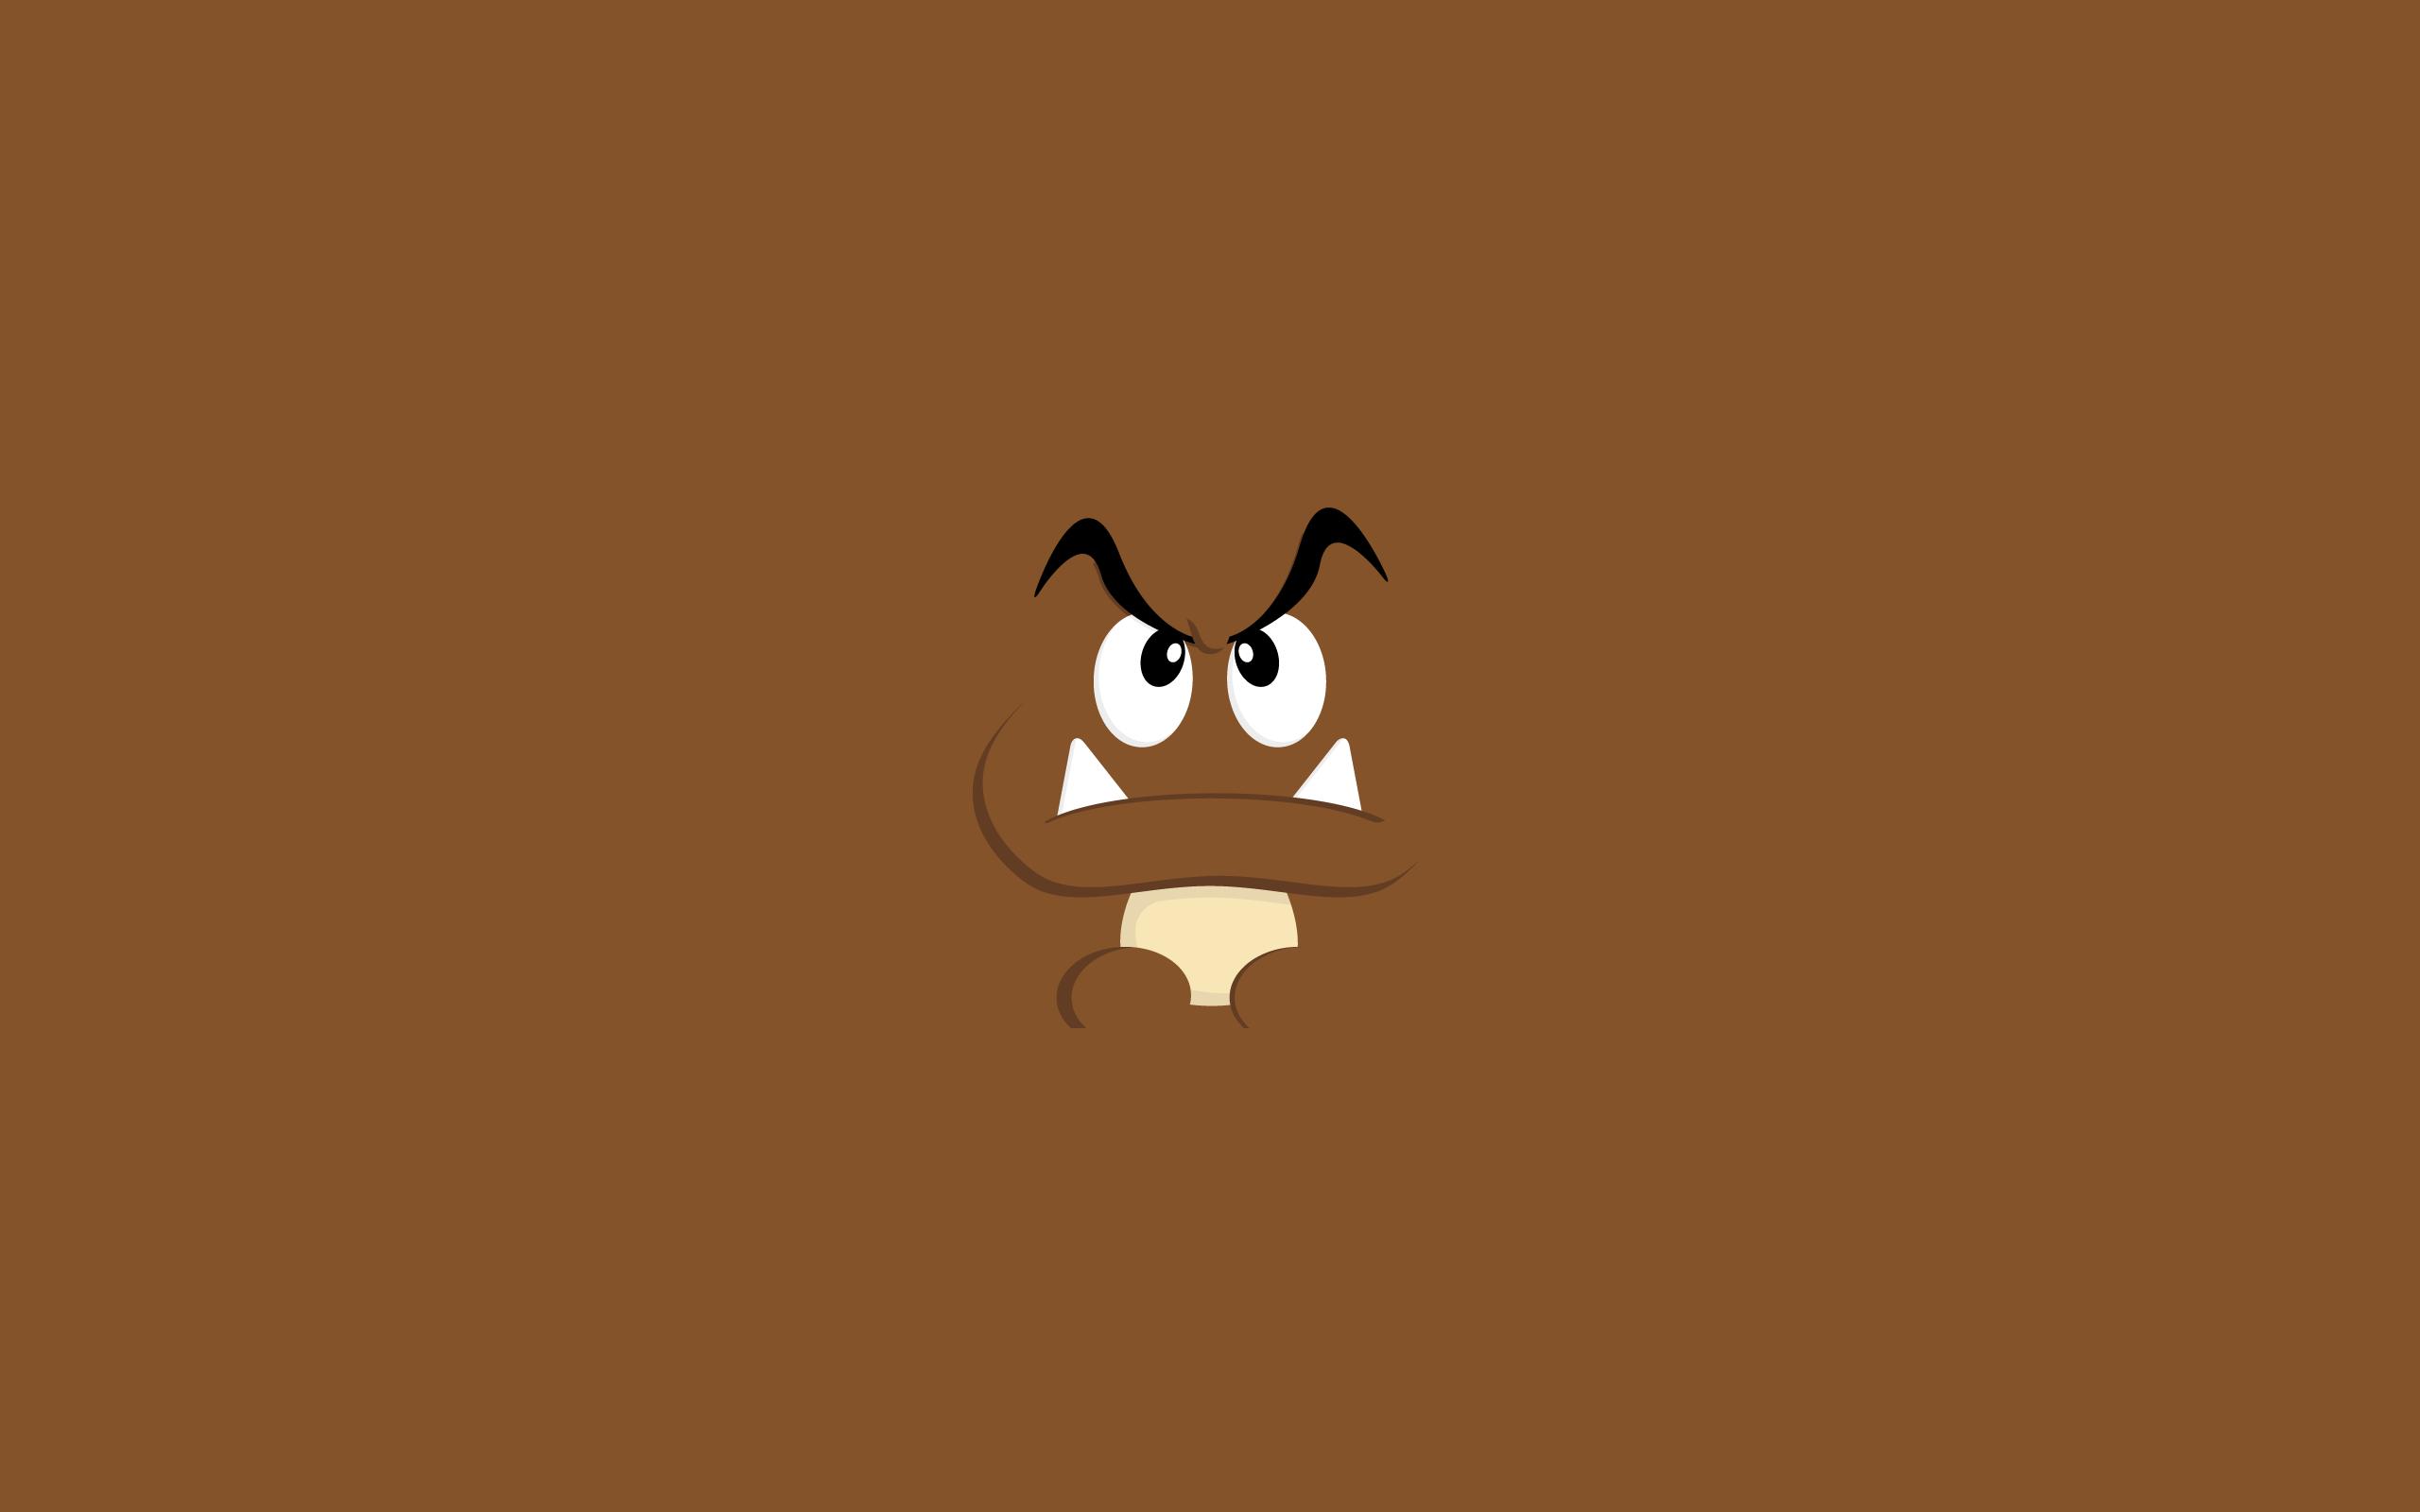 Goomba - Nintendo Villains fond d'écran (26502643) - fanpop